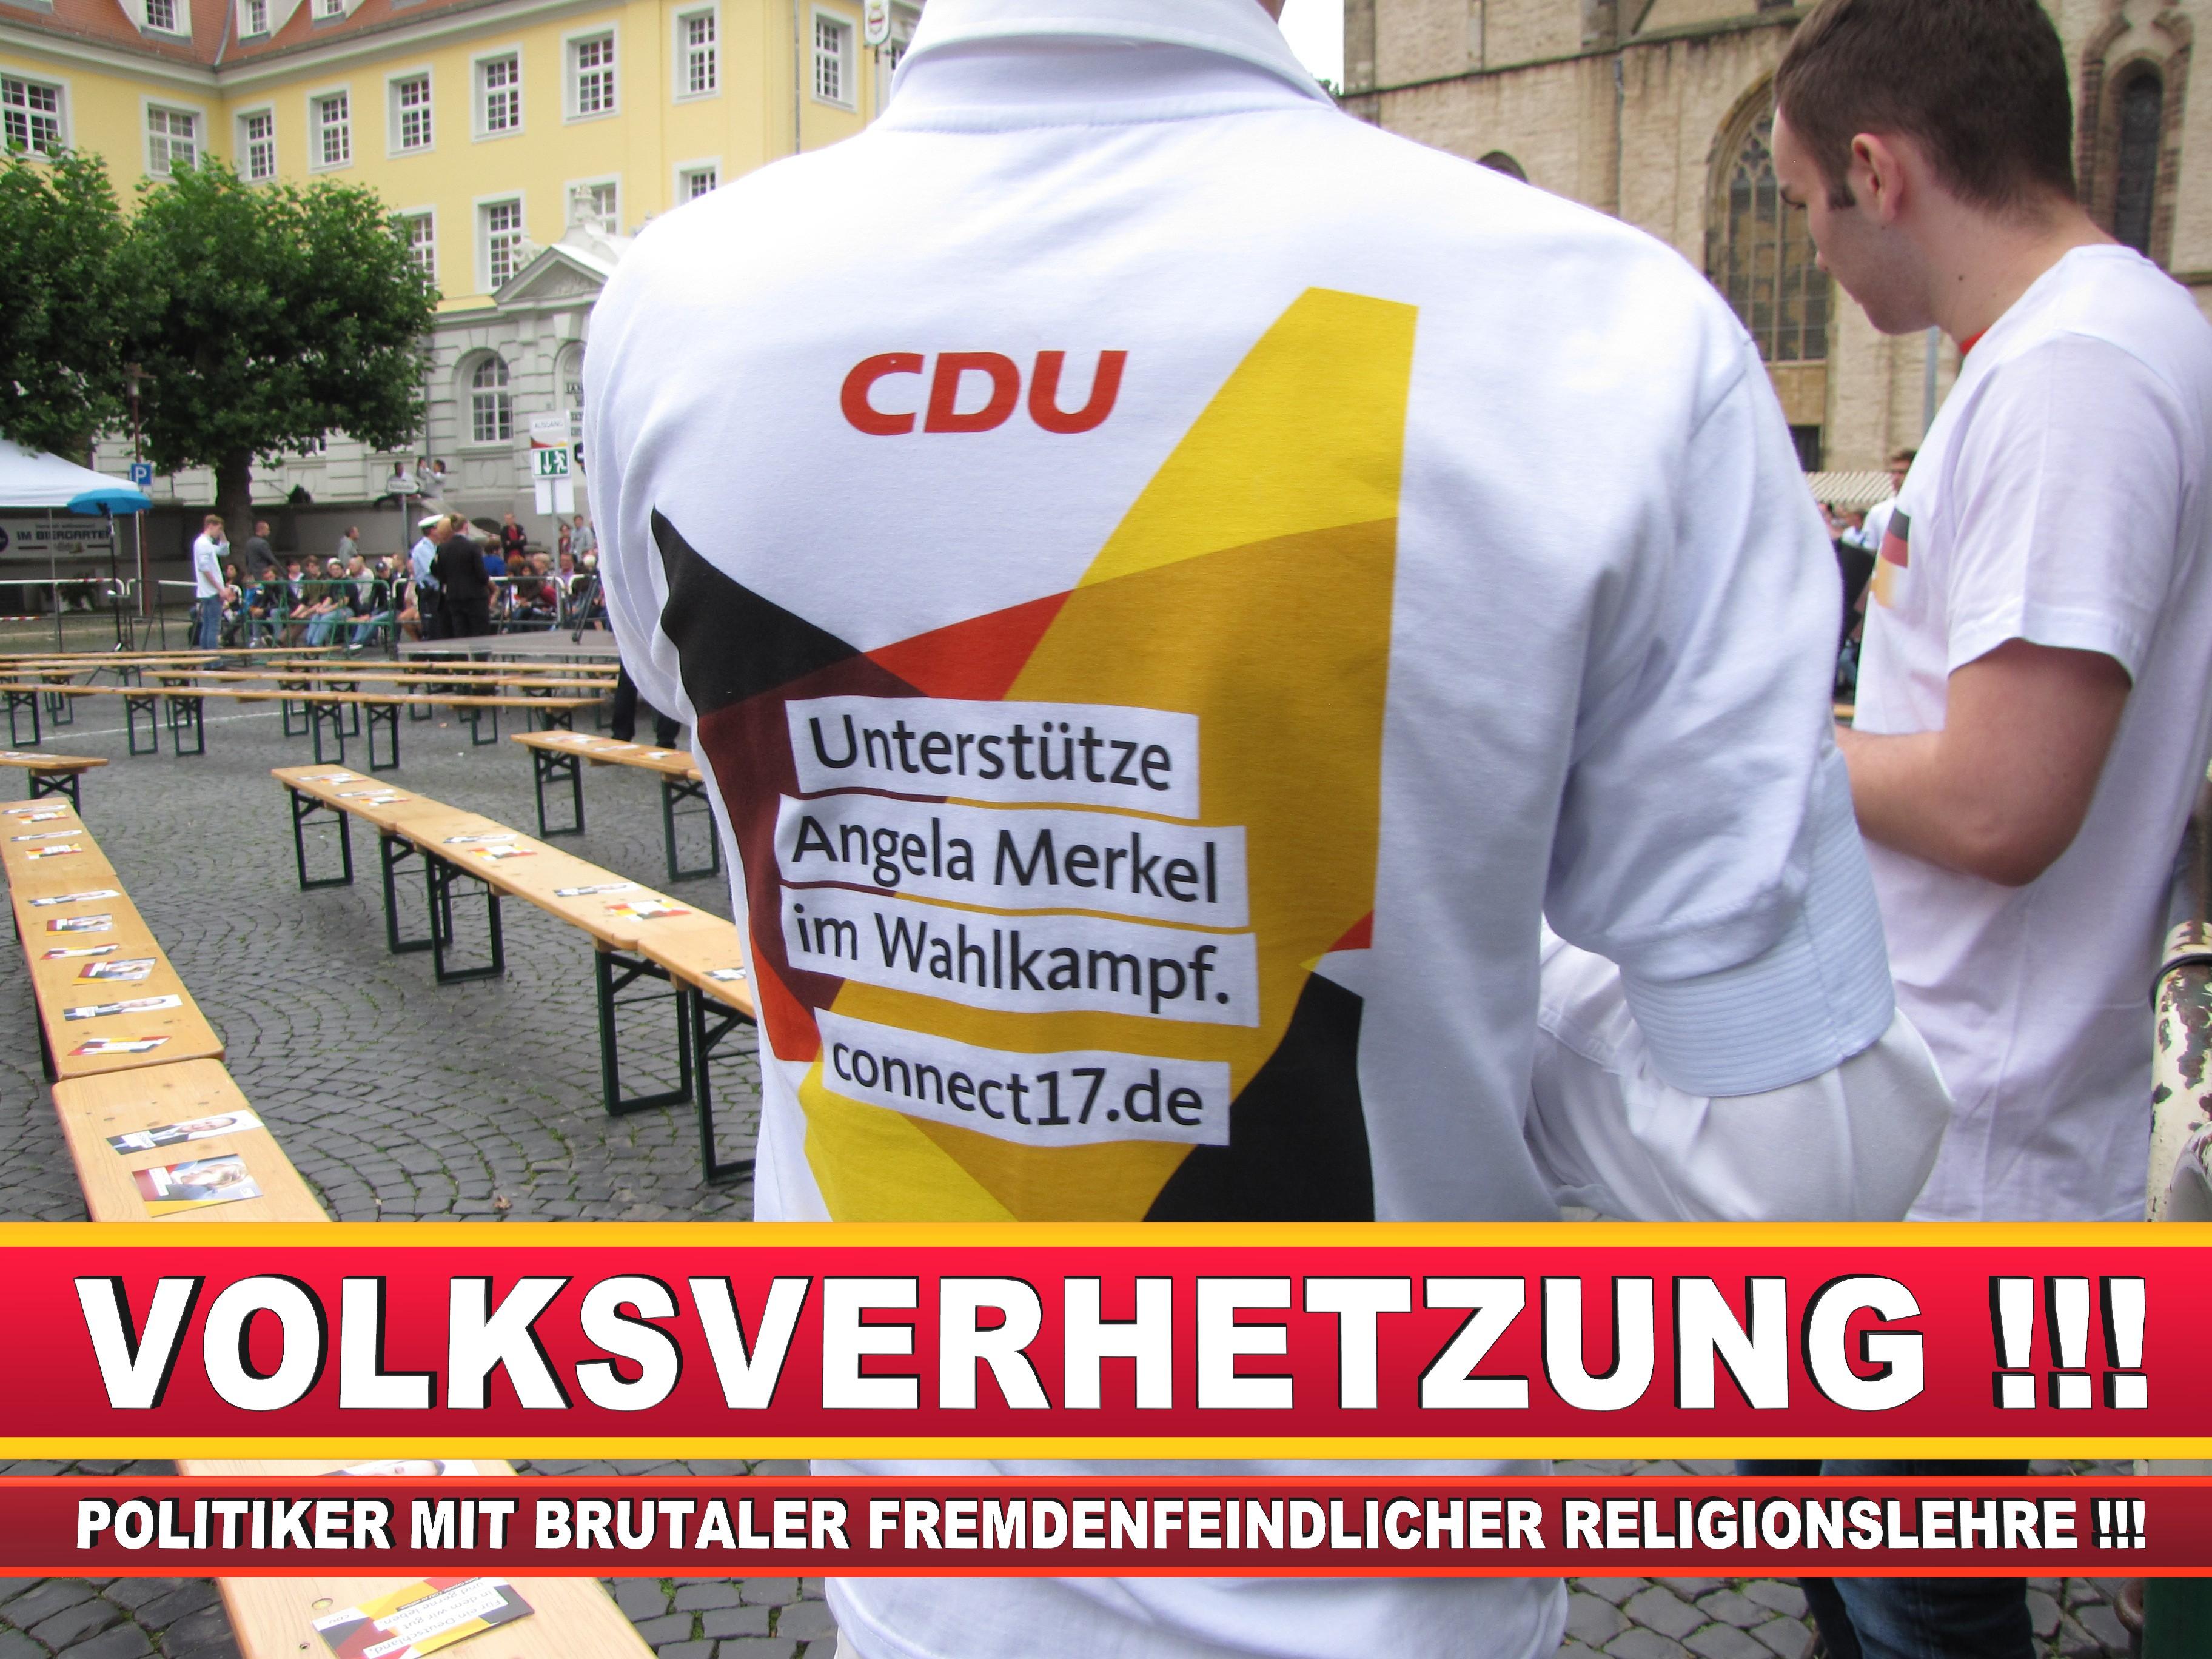 CDU HERFORD Kurruption Betrug Kinderpornografie Kinderpornos (10)